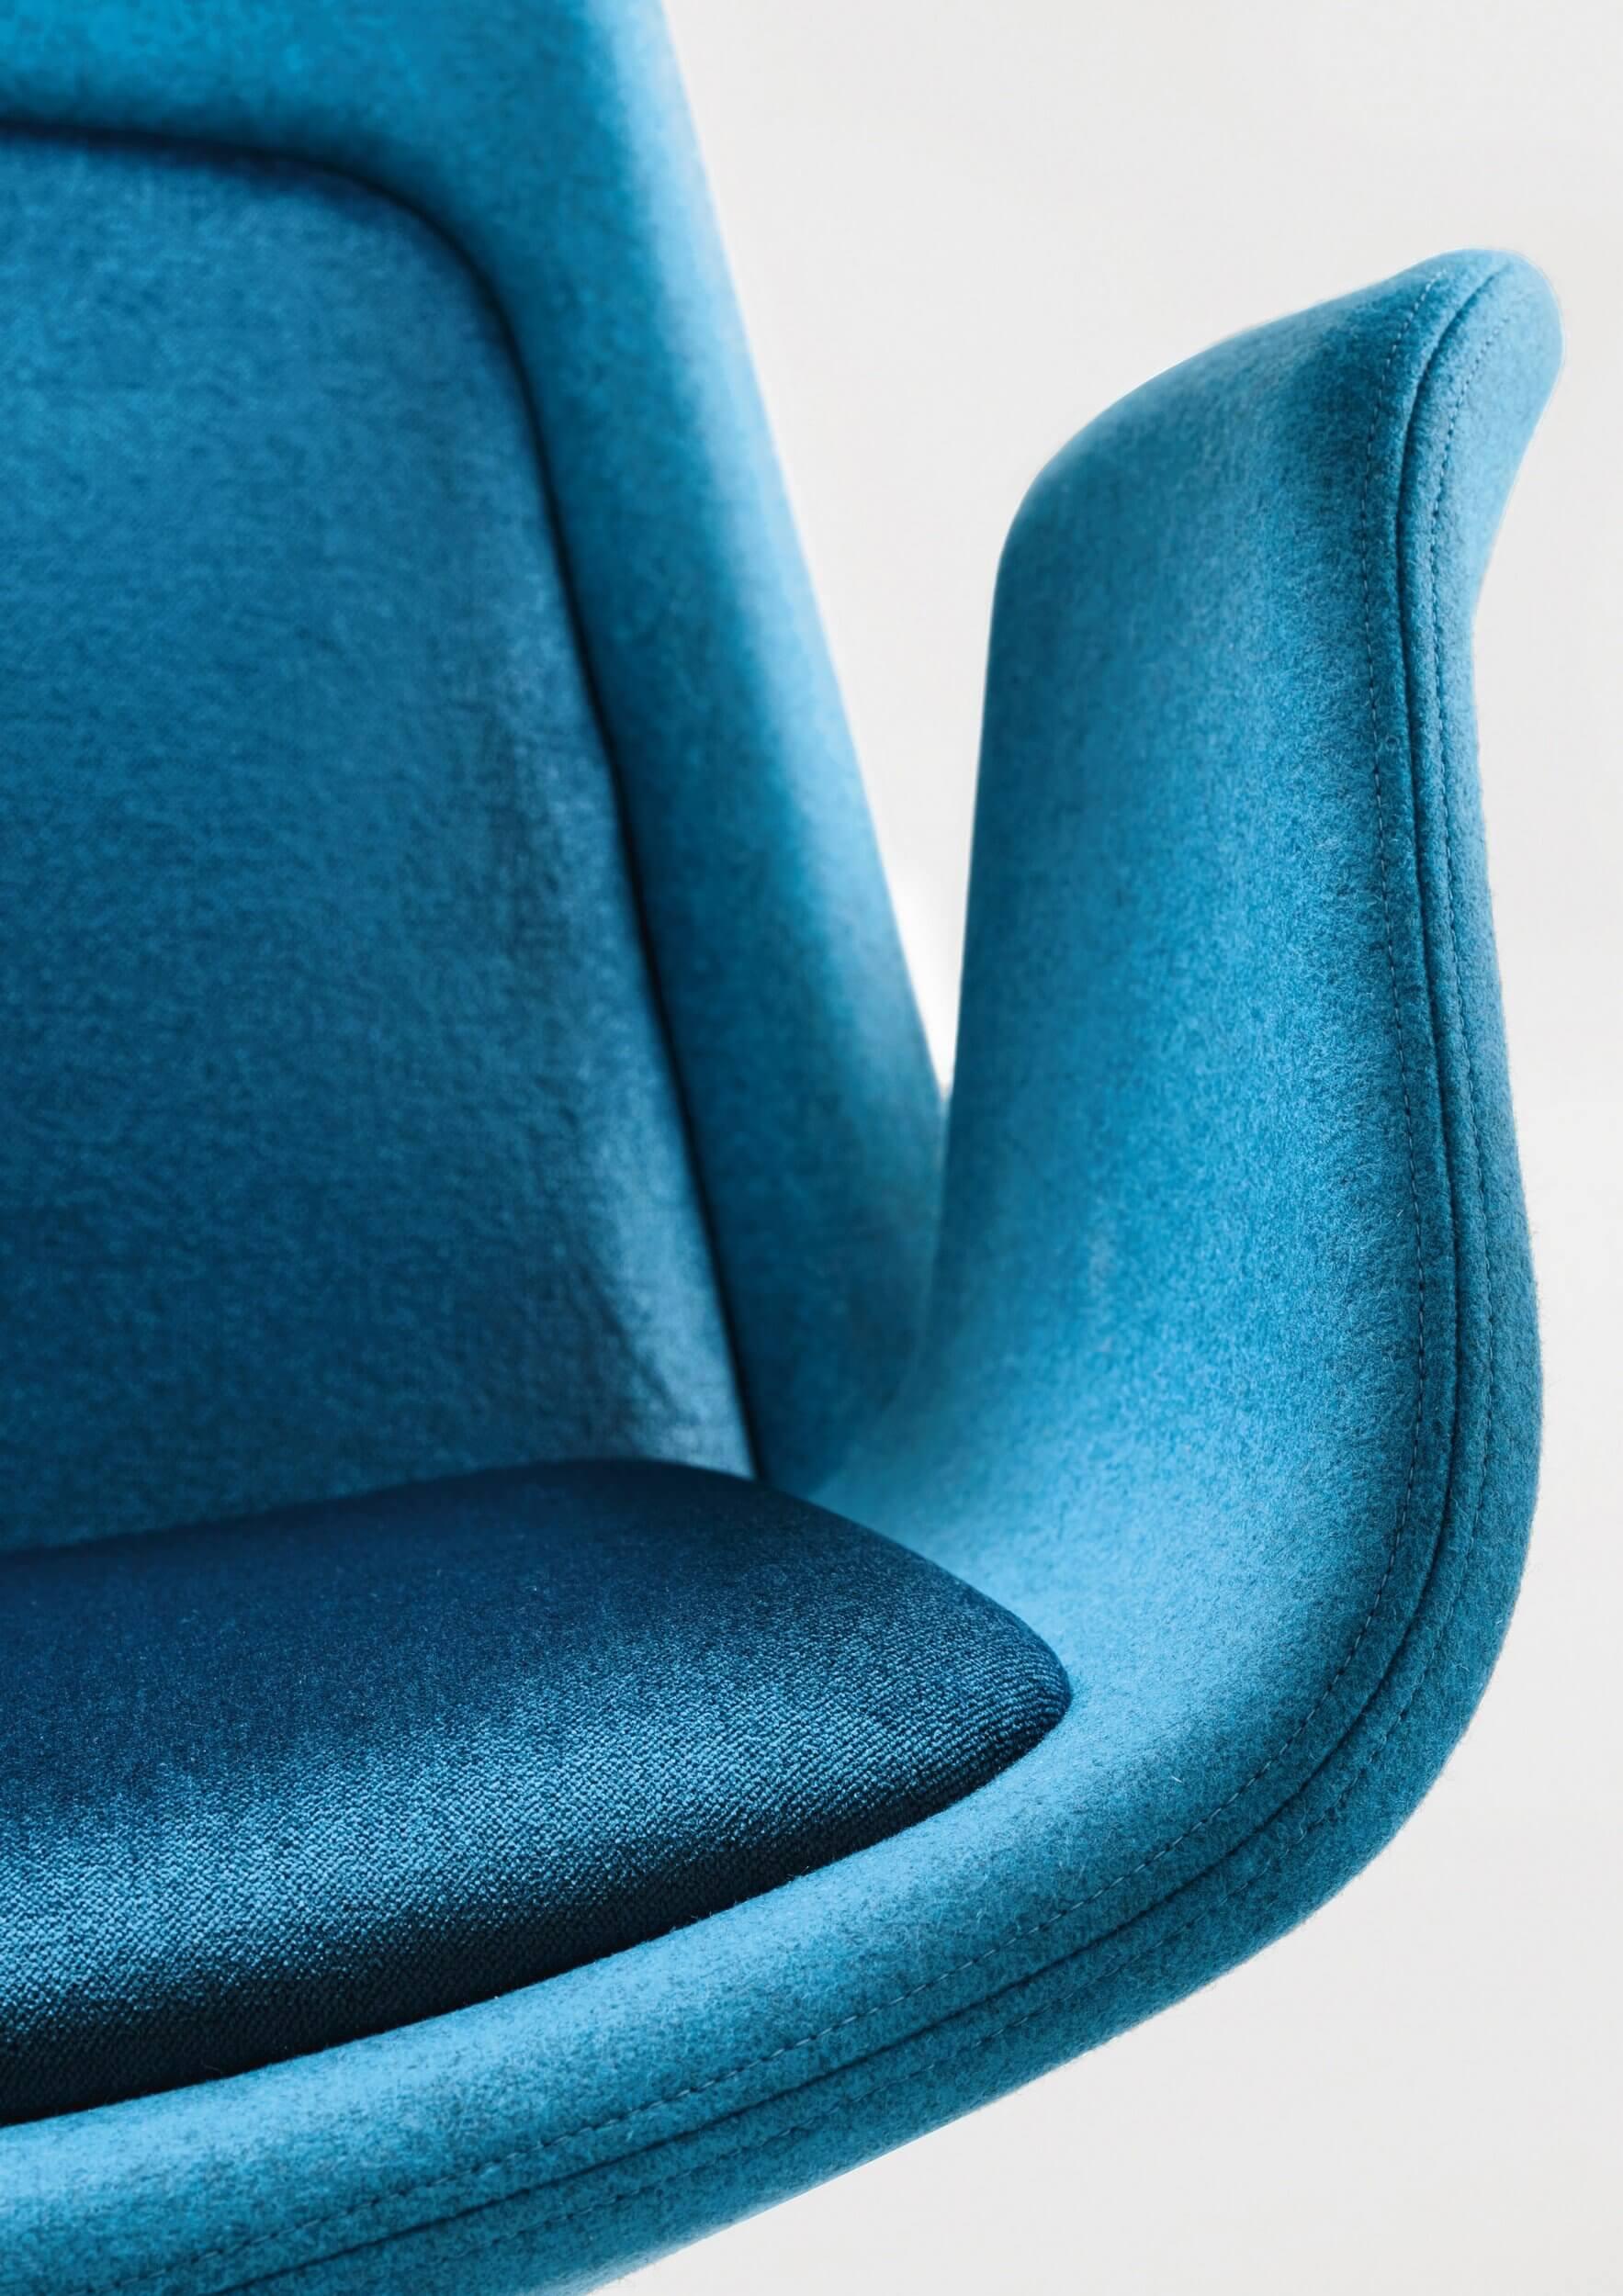 Mobilier lounge design scandinave